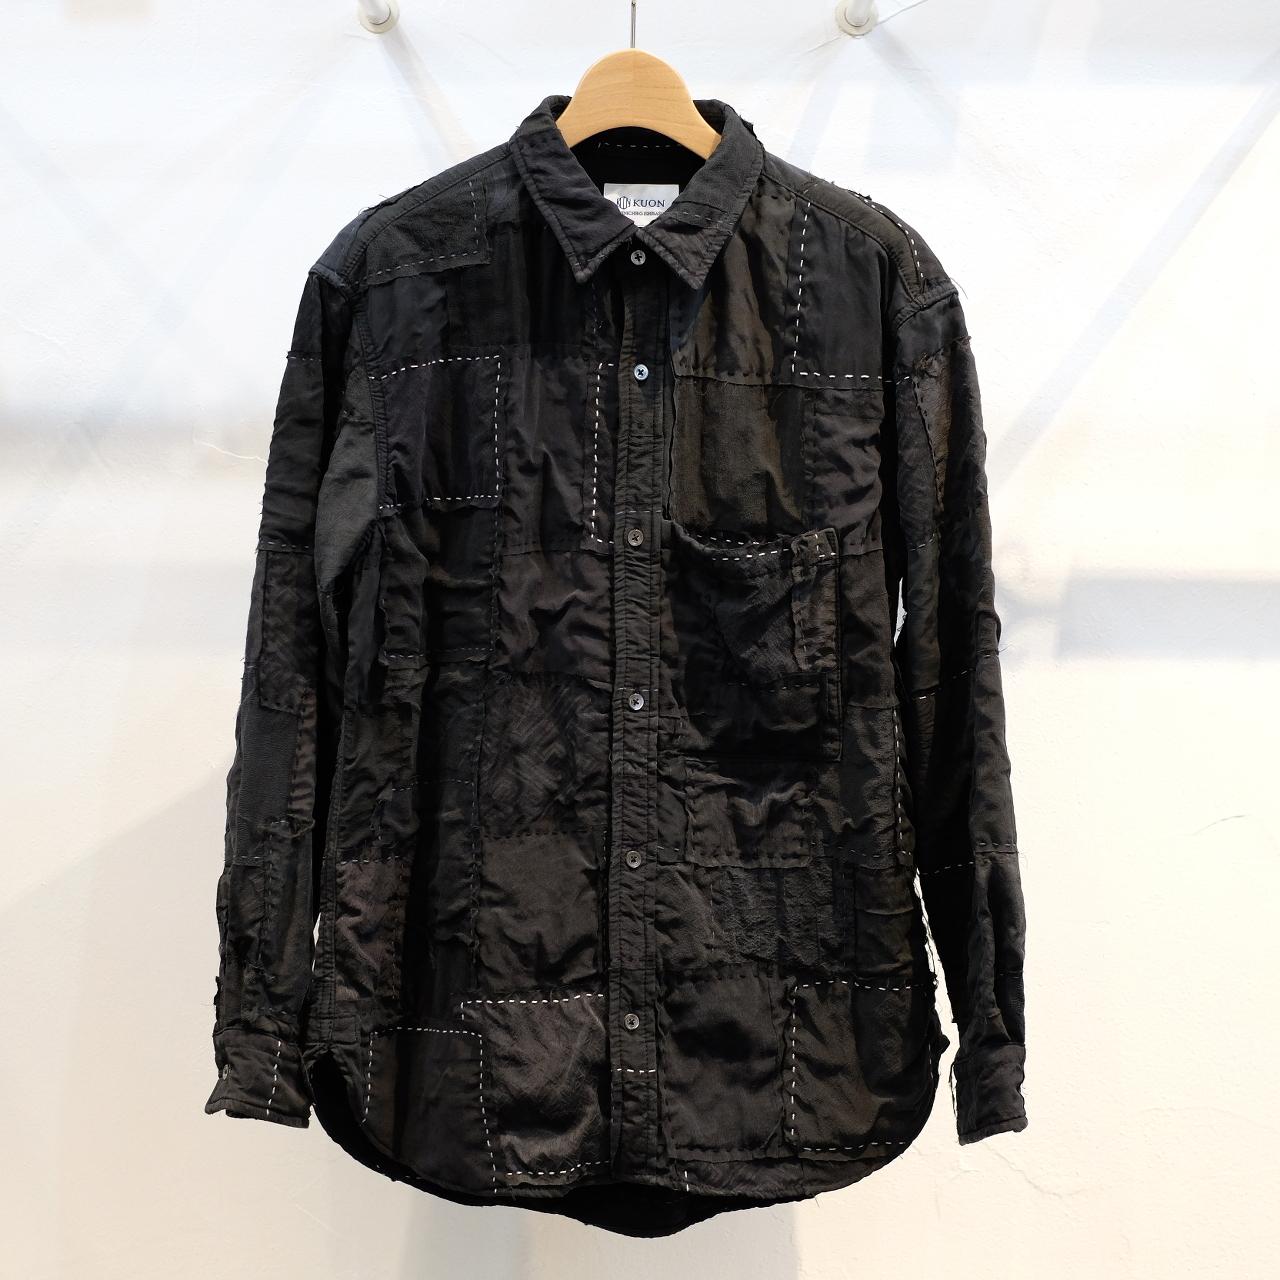 KUON(クオン) 着物襤褸(古布)パッチワーク・黒反応染めアップサイクルシャツ(シャツジャケット) CIRCLE特注